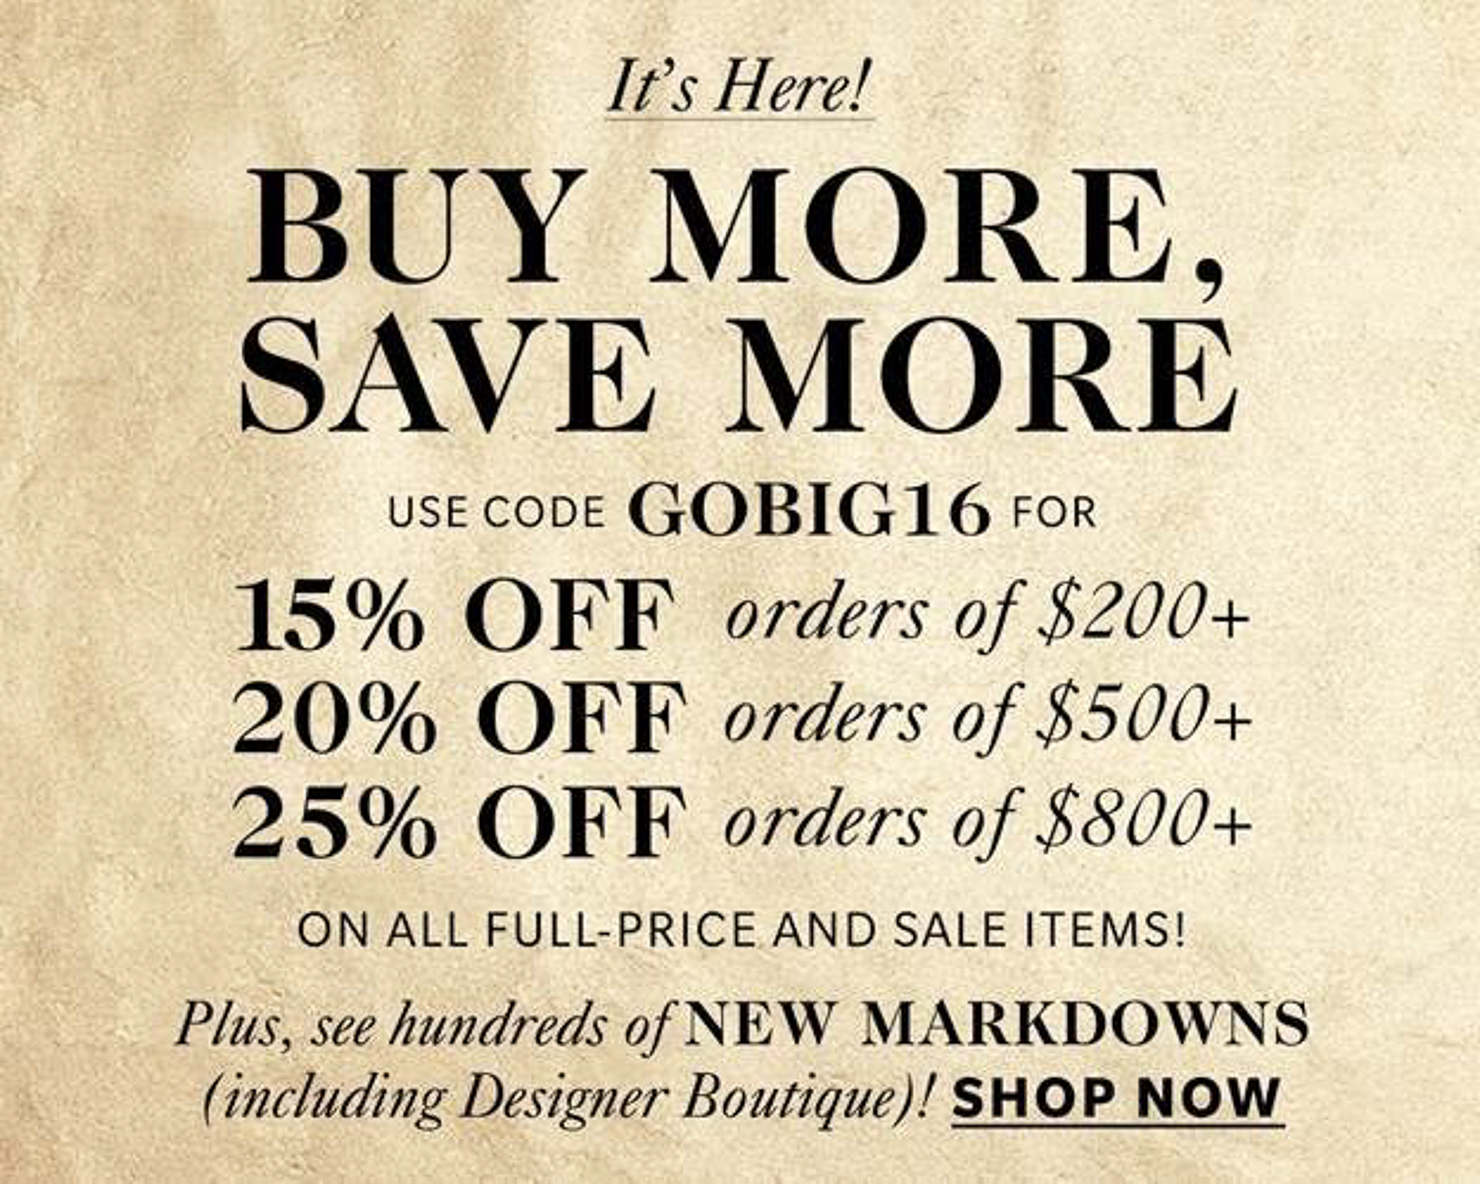 shopbop-black-friday-sale